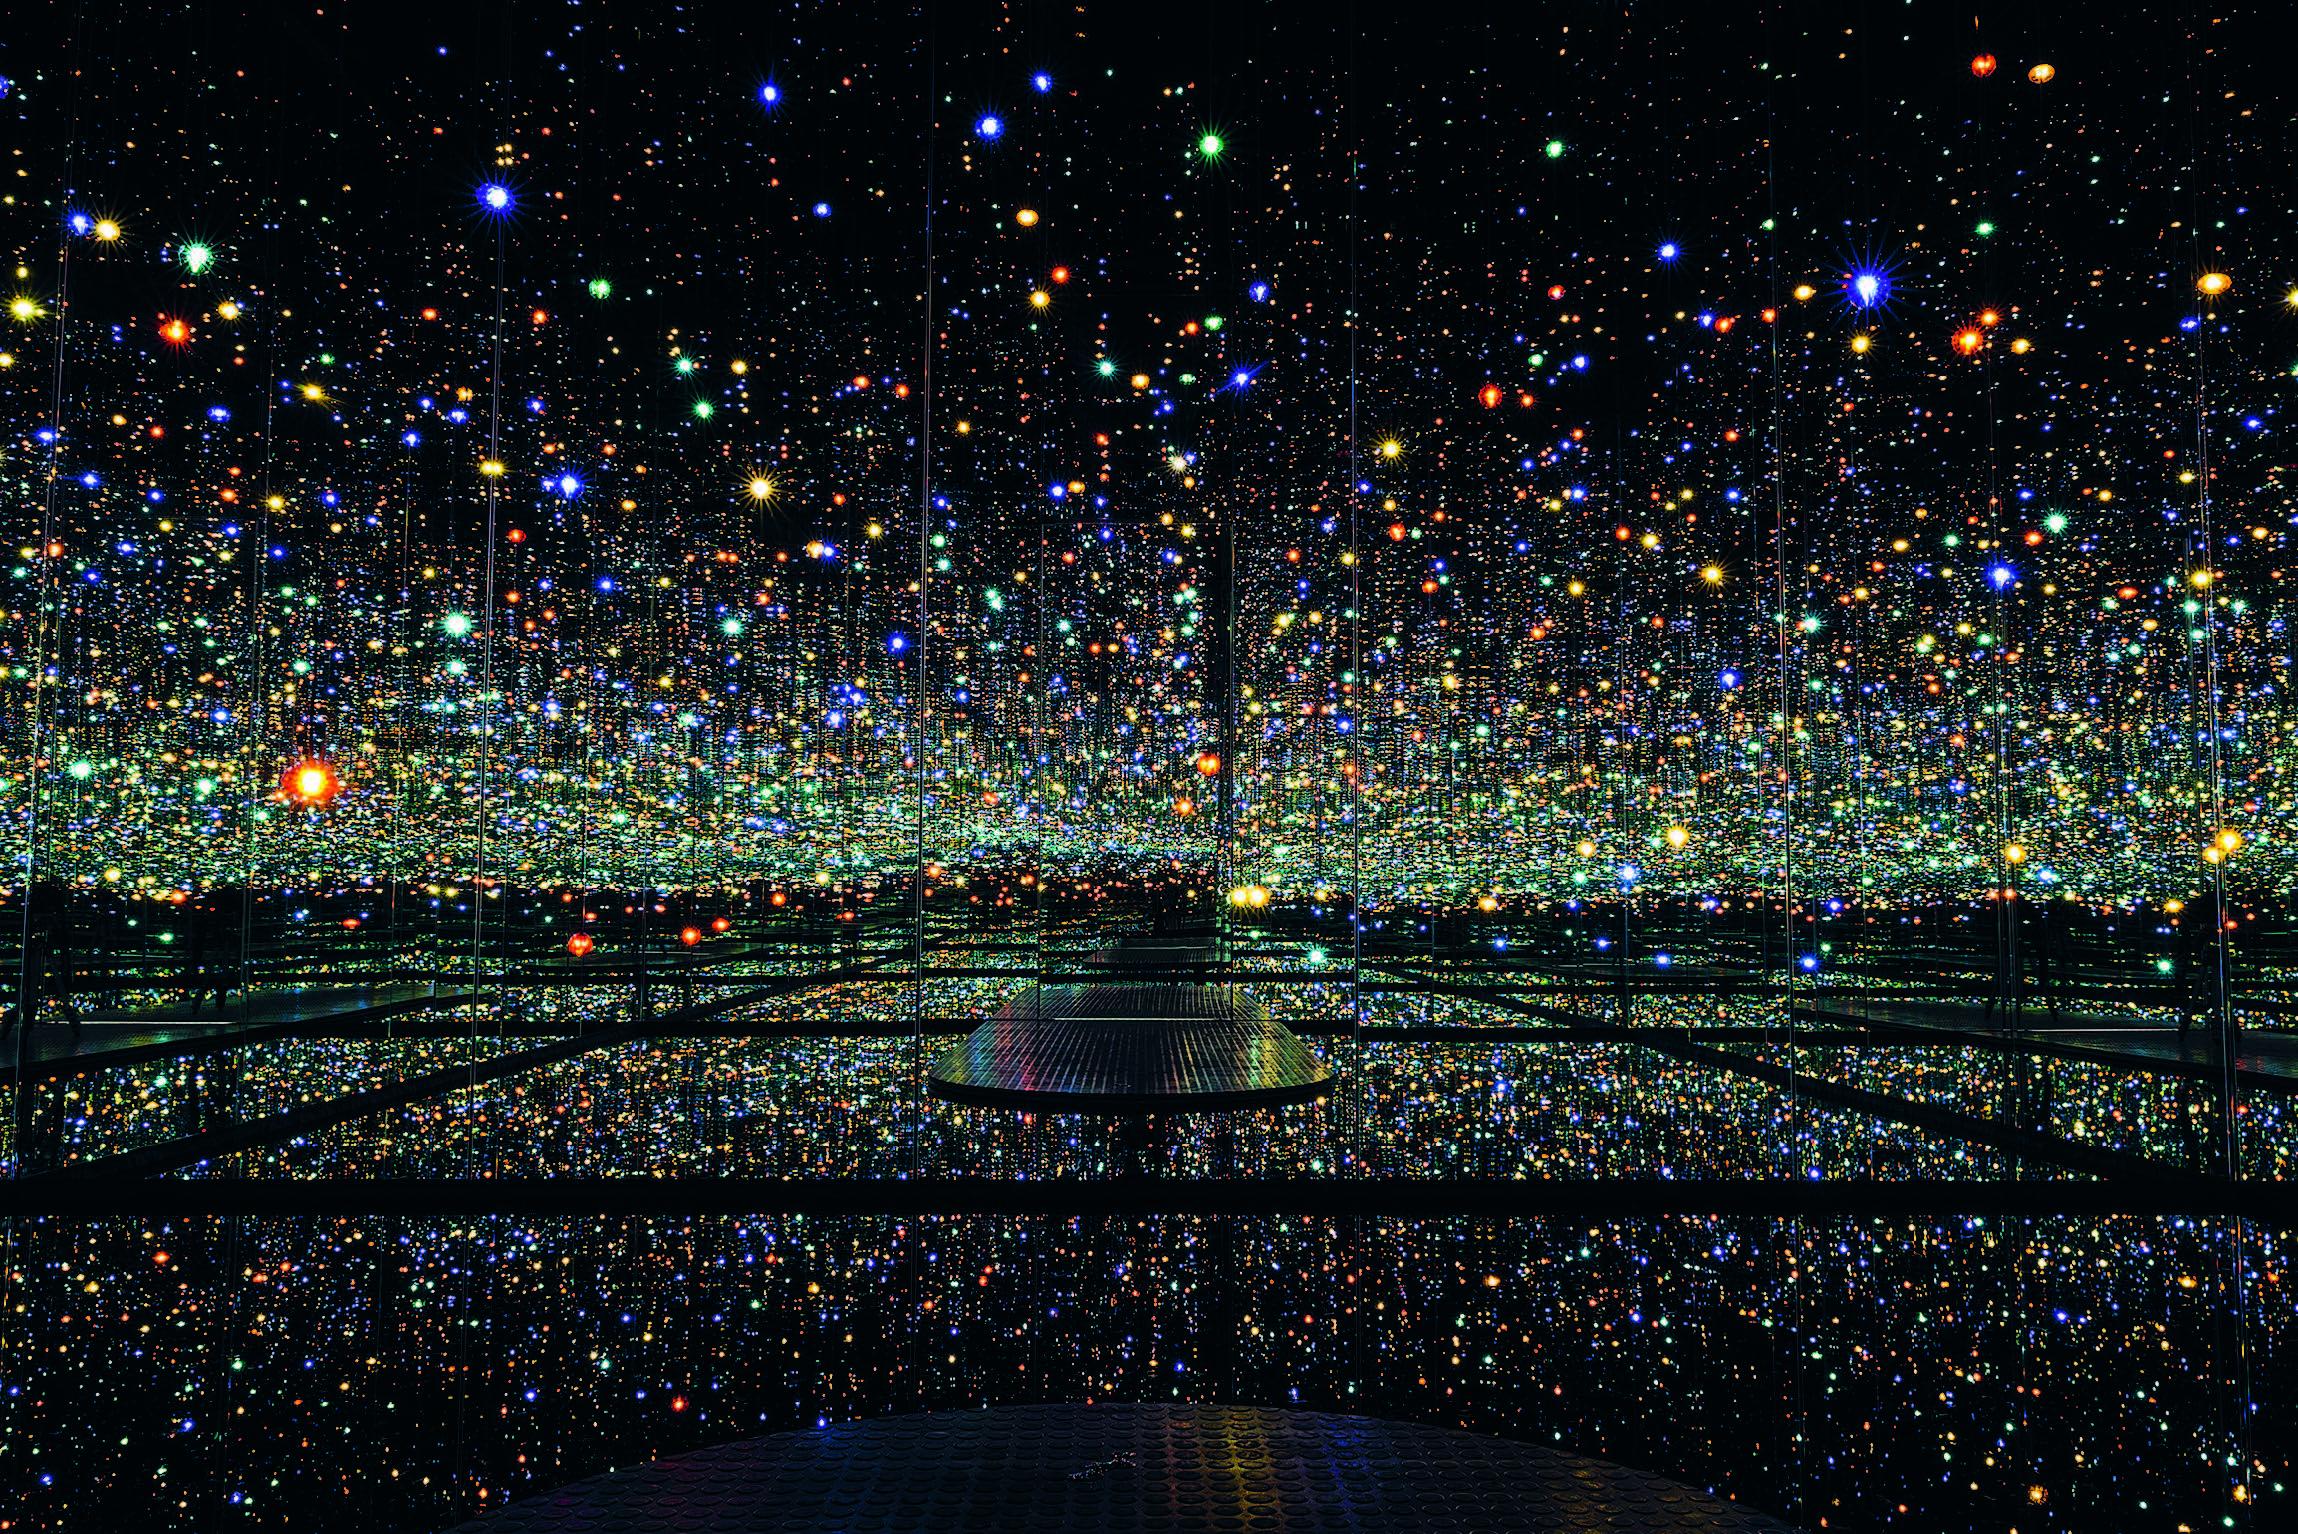 Infnity Room, Yayoi Kusama, Los Angeles